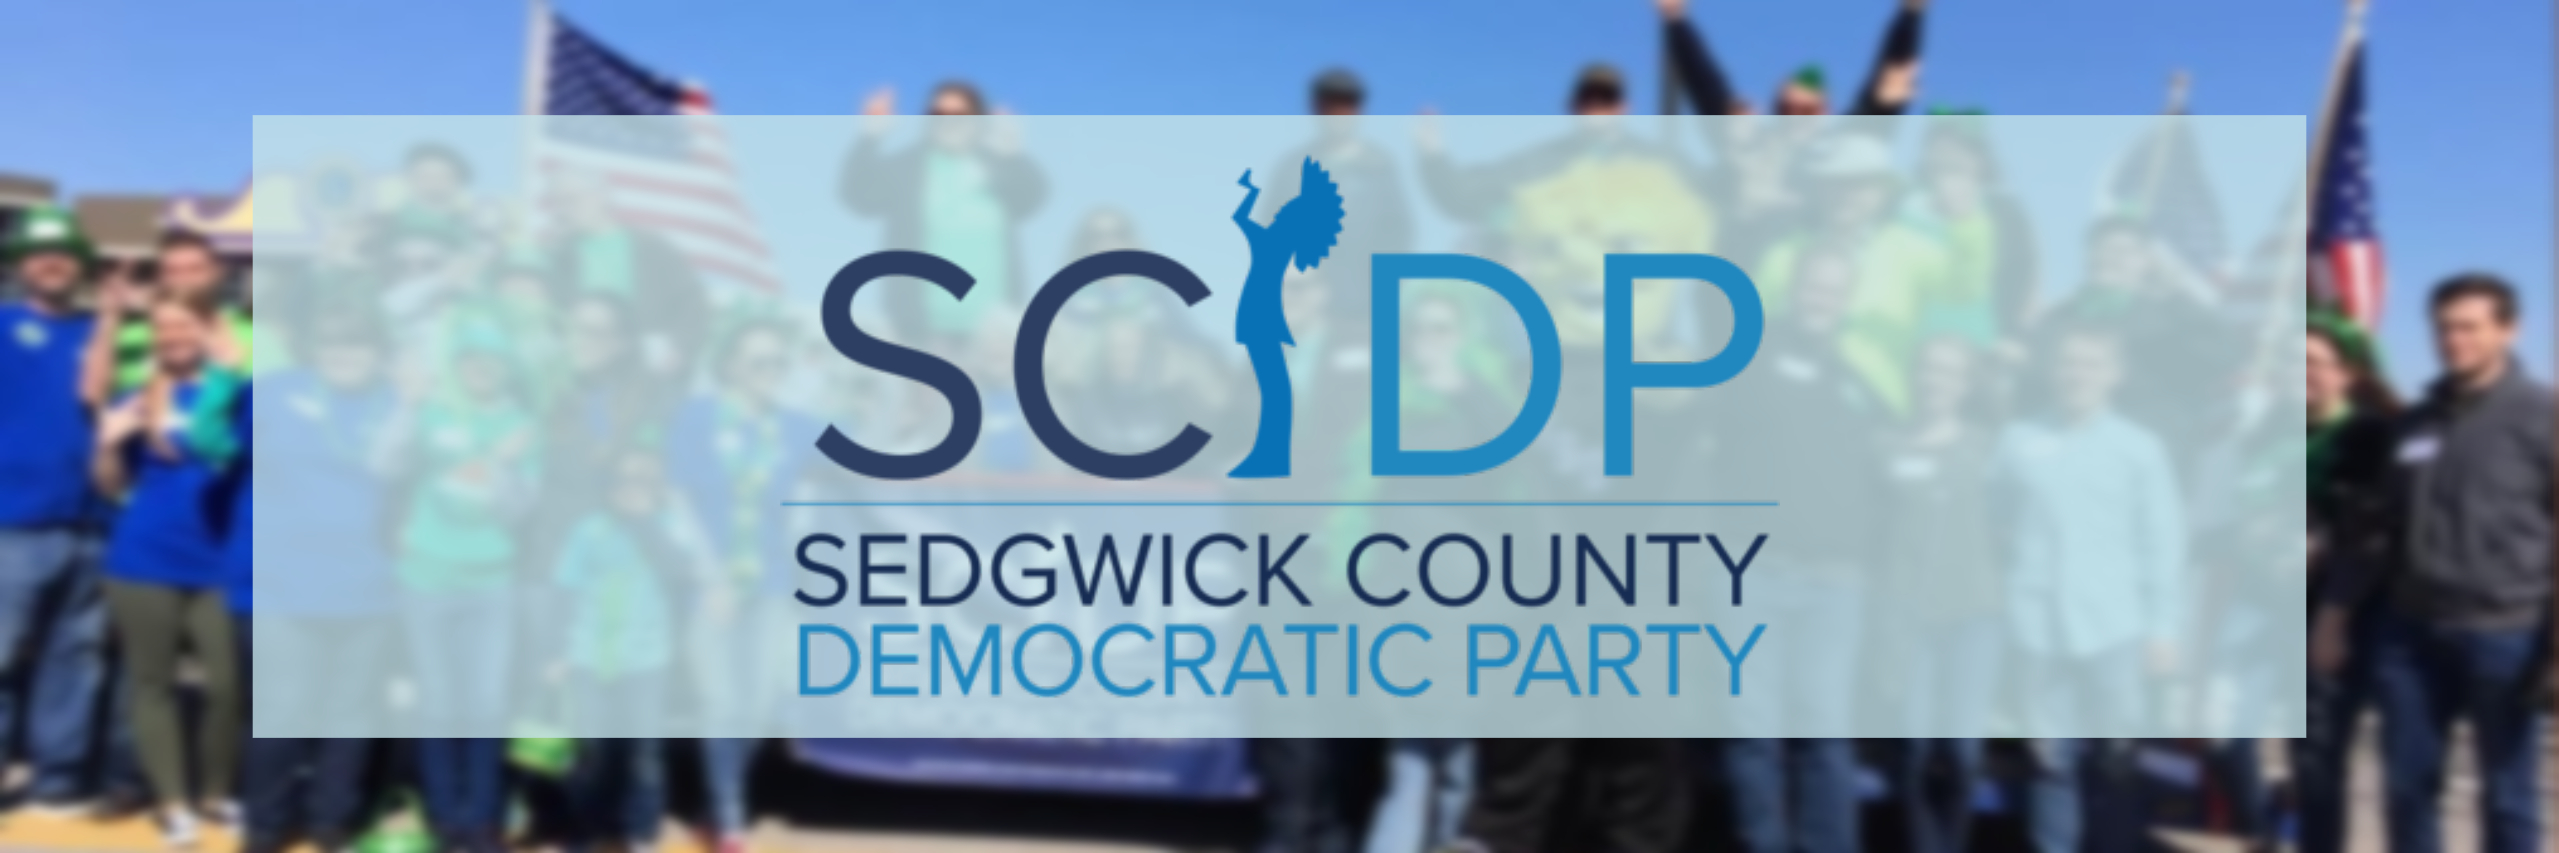 Sedgwick County Democratic Party (KS)